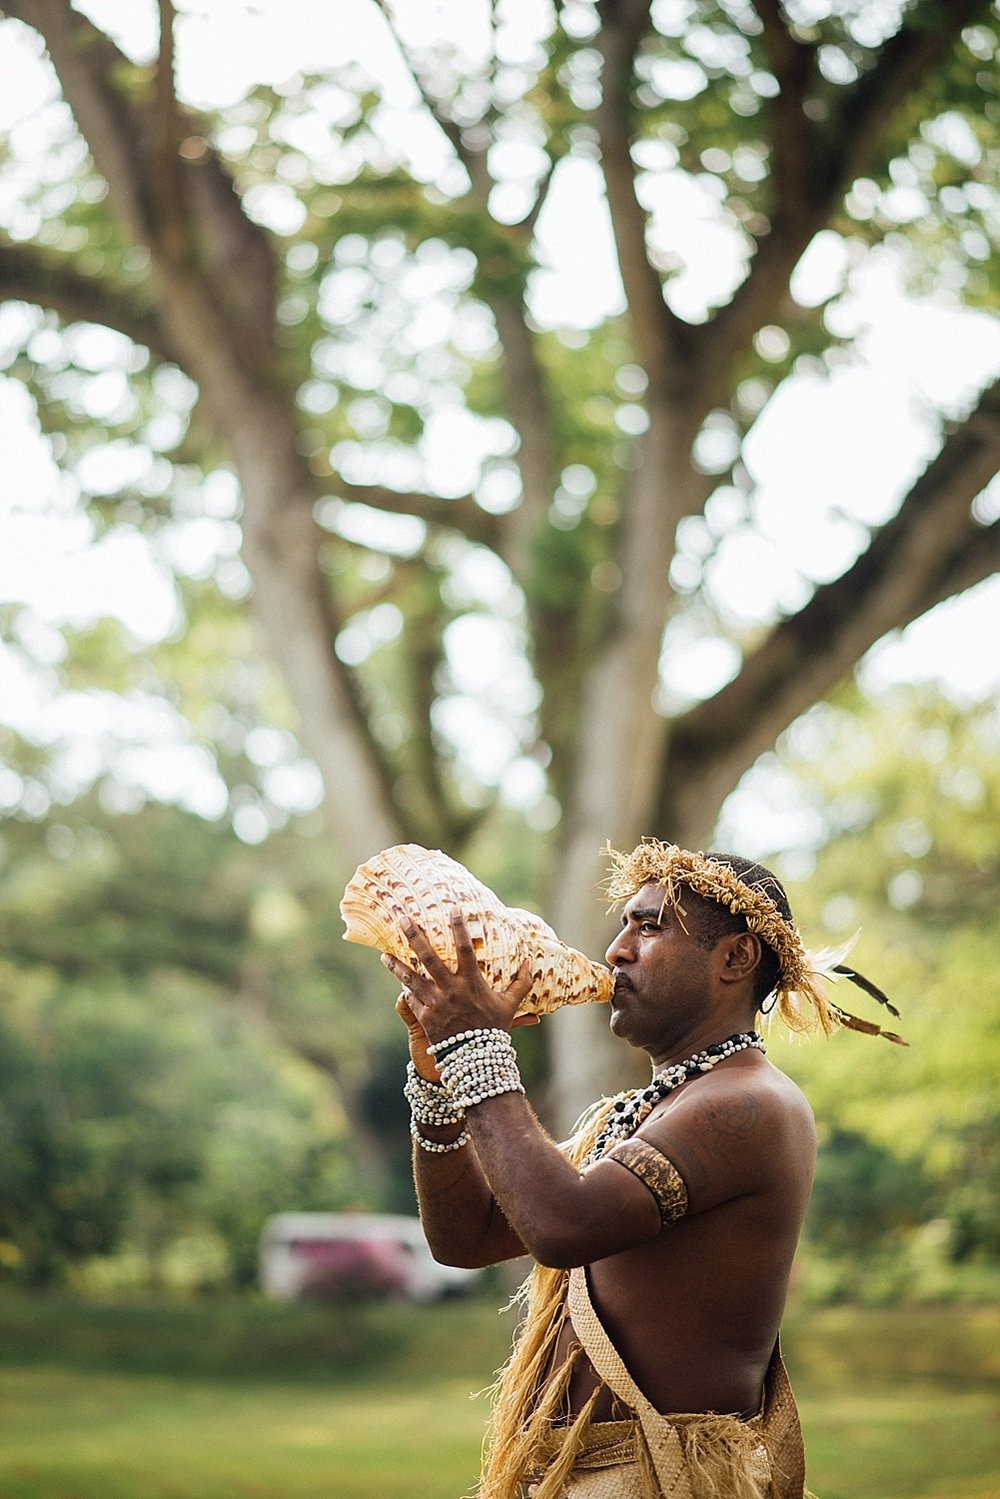 Deanna-Michael-WeddingPhotography-HolidayInnResort-GroovyBanana-VanuatuPhotographers_0007.jpg